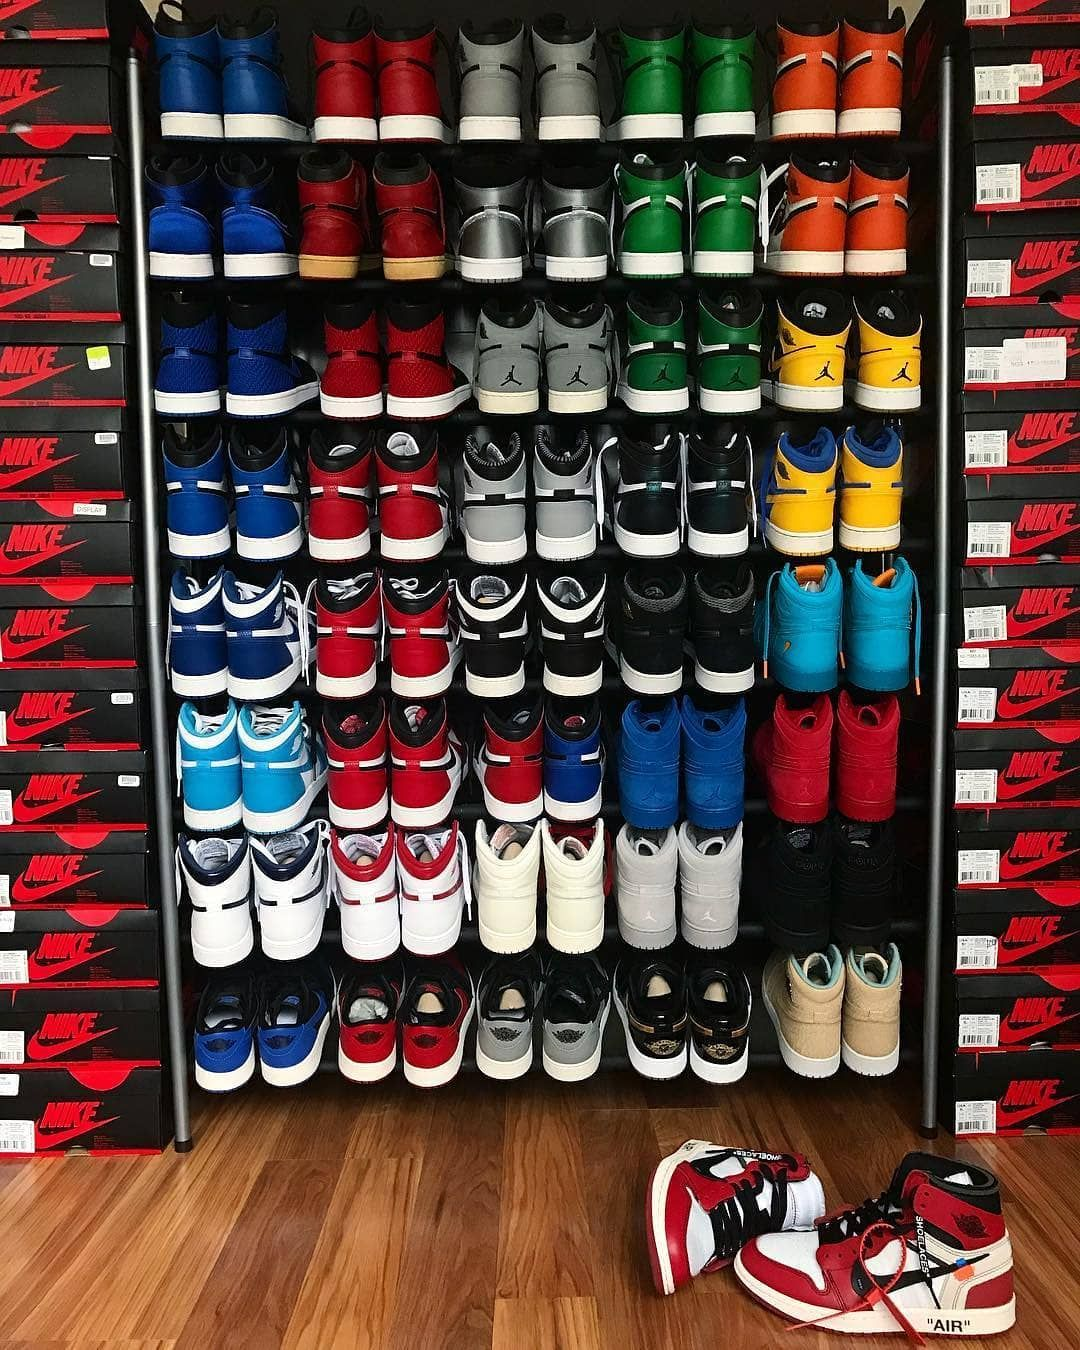 When You Got 1 Love Styleisaweapon Sneakers Wallpaper Sneaker Head Closet Sneaker Closet